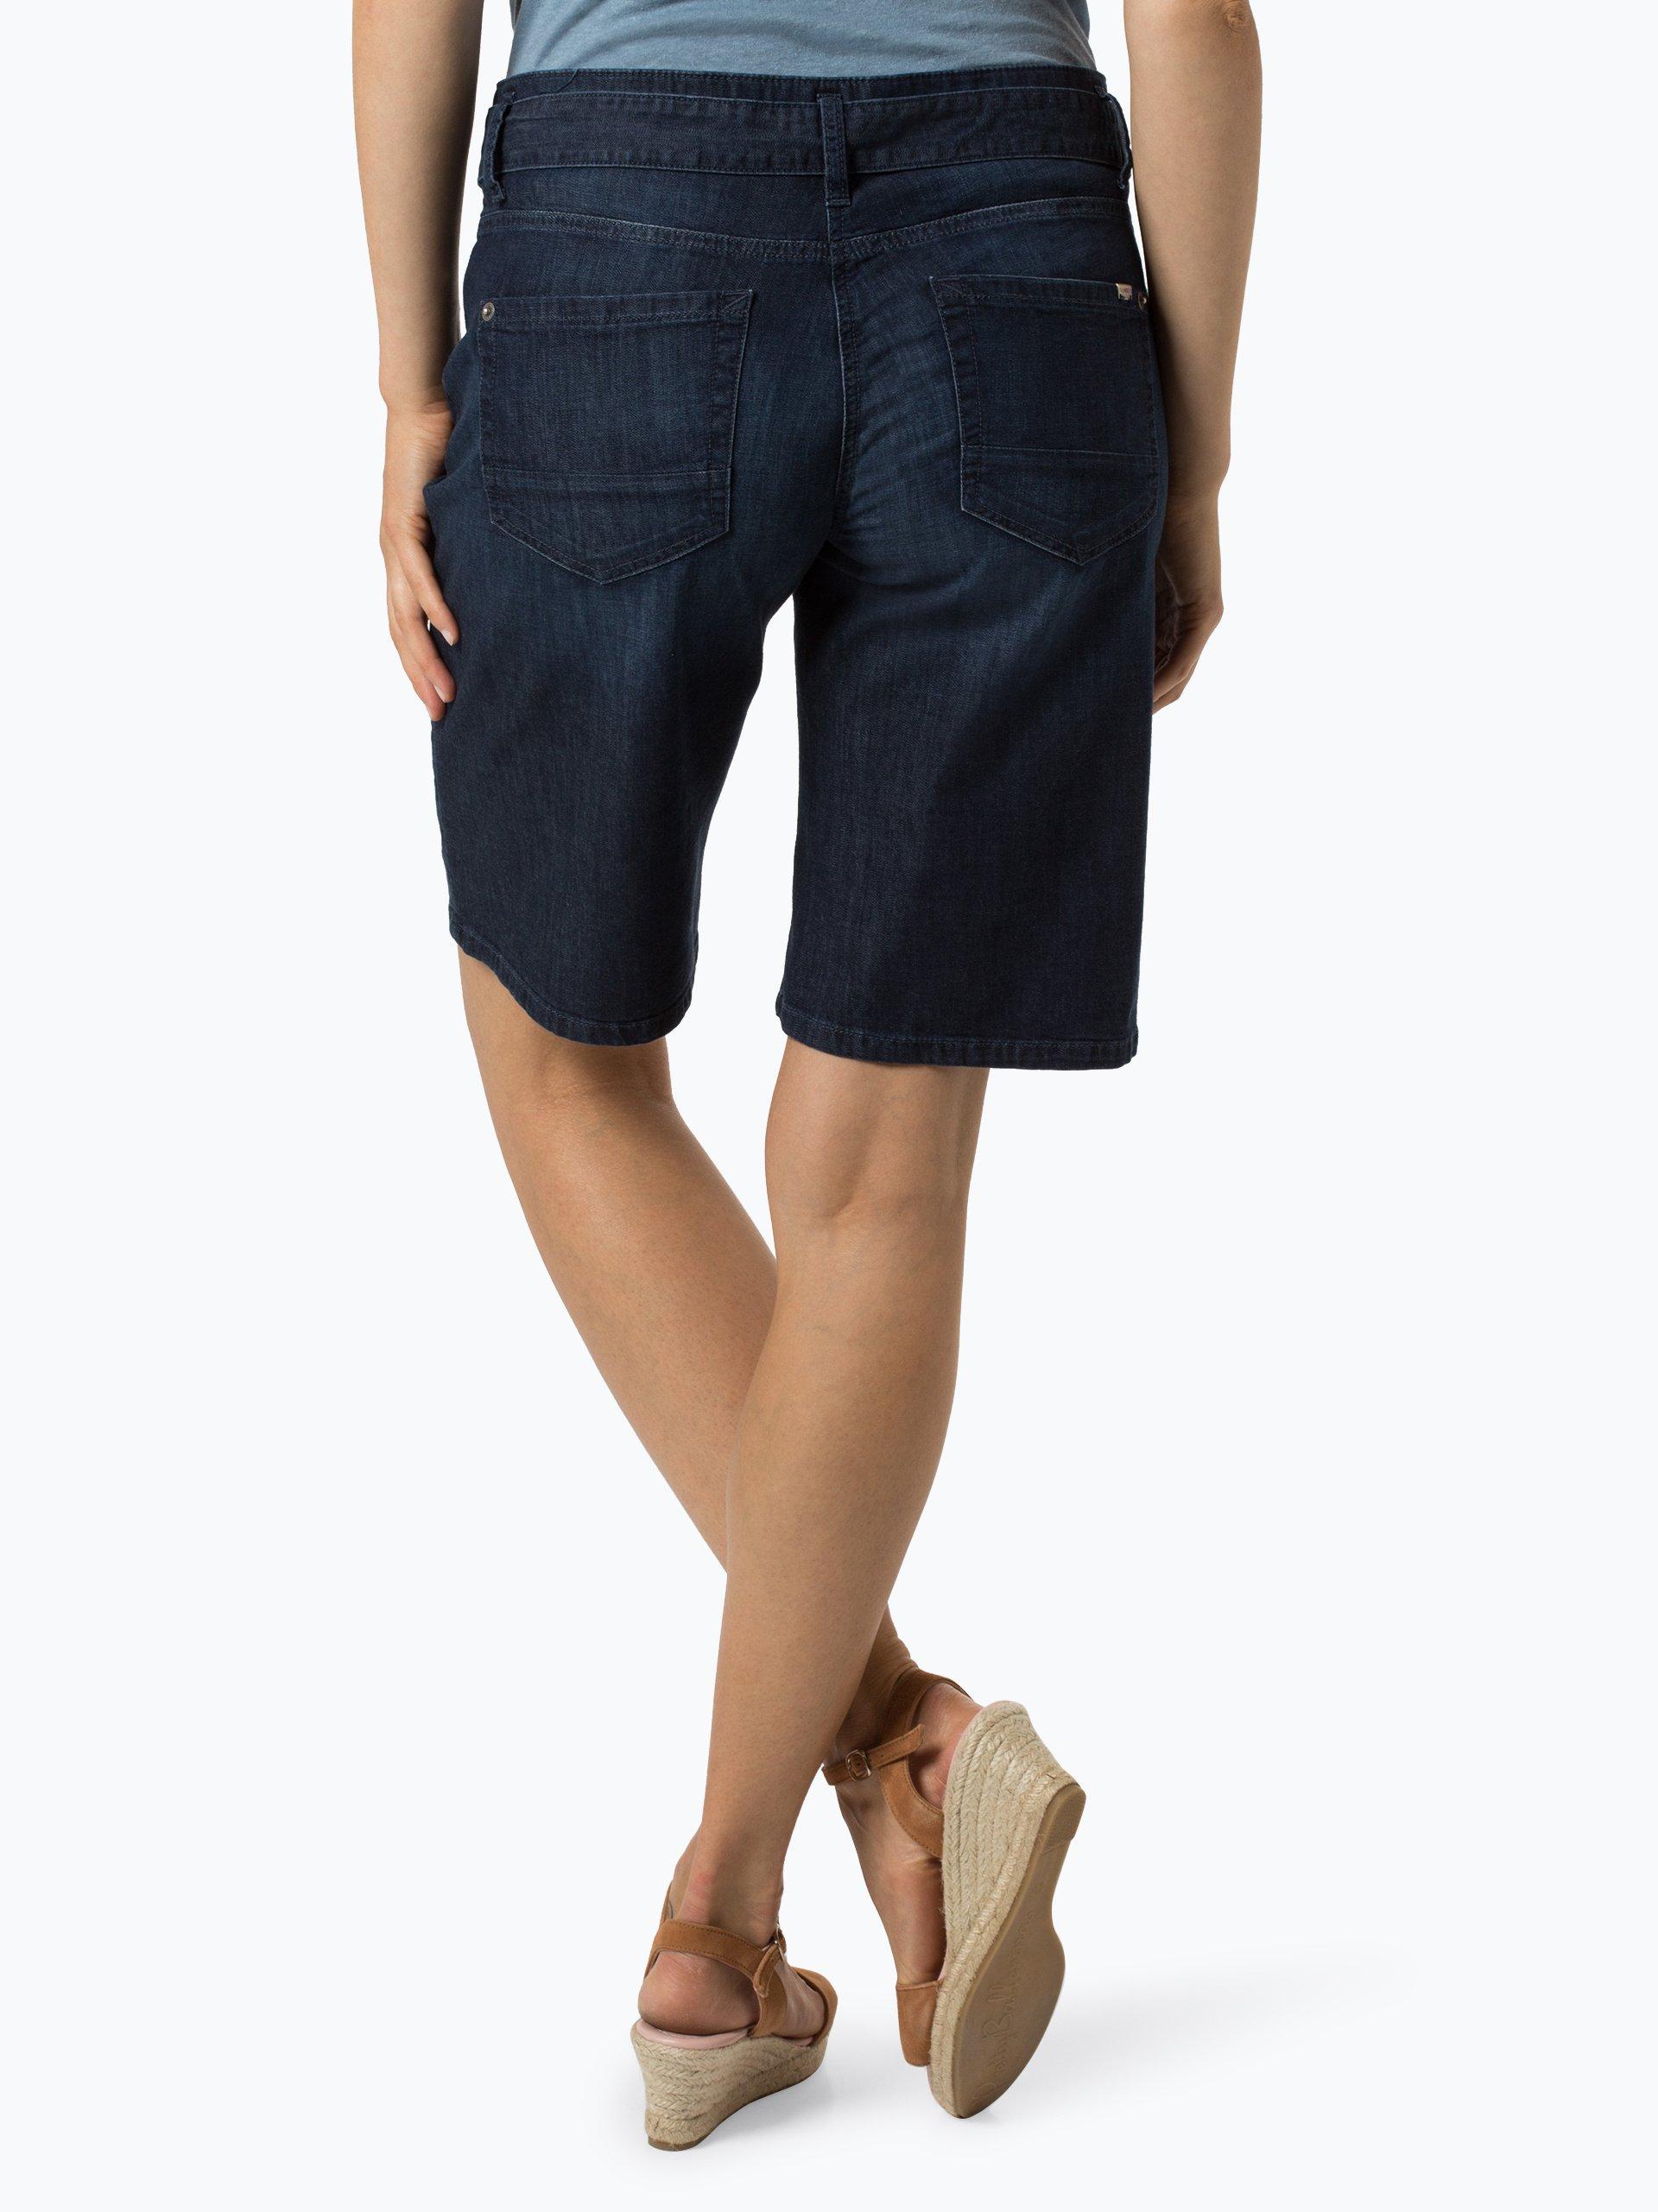 Cambio Damen Jeansshorts - Lizzi